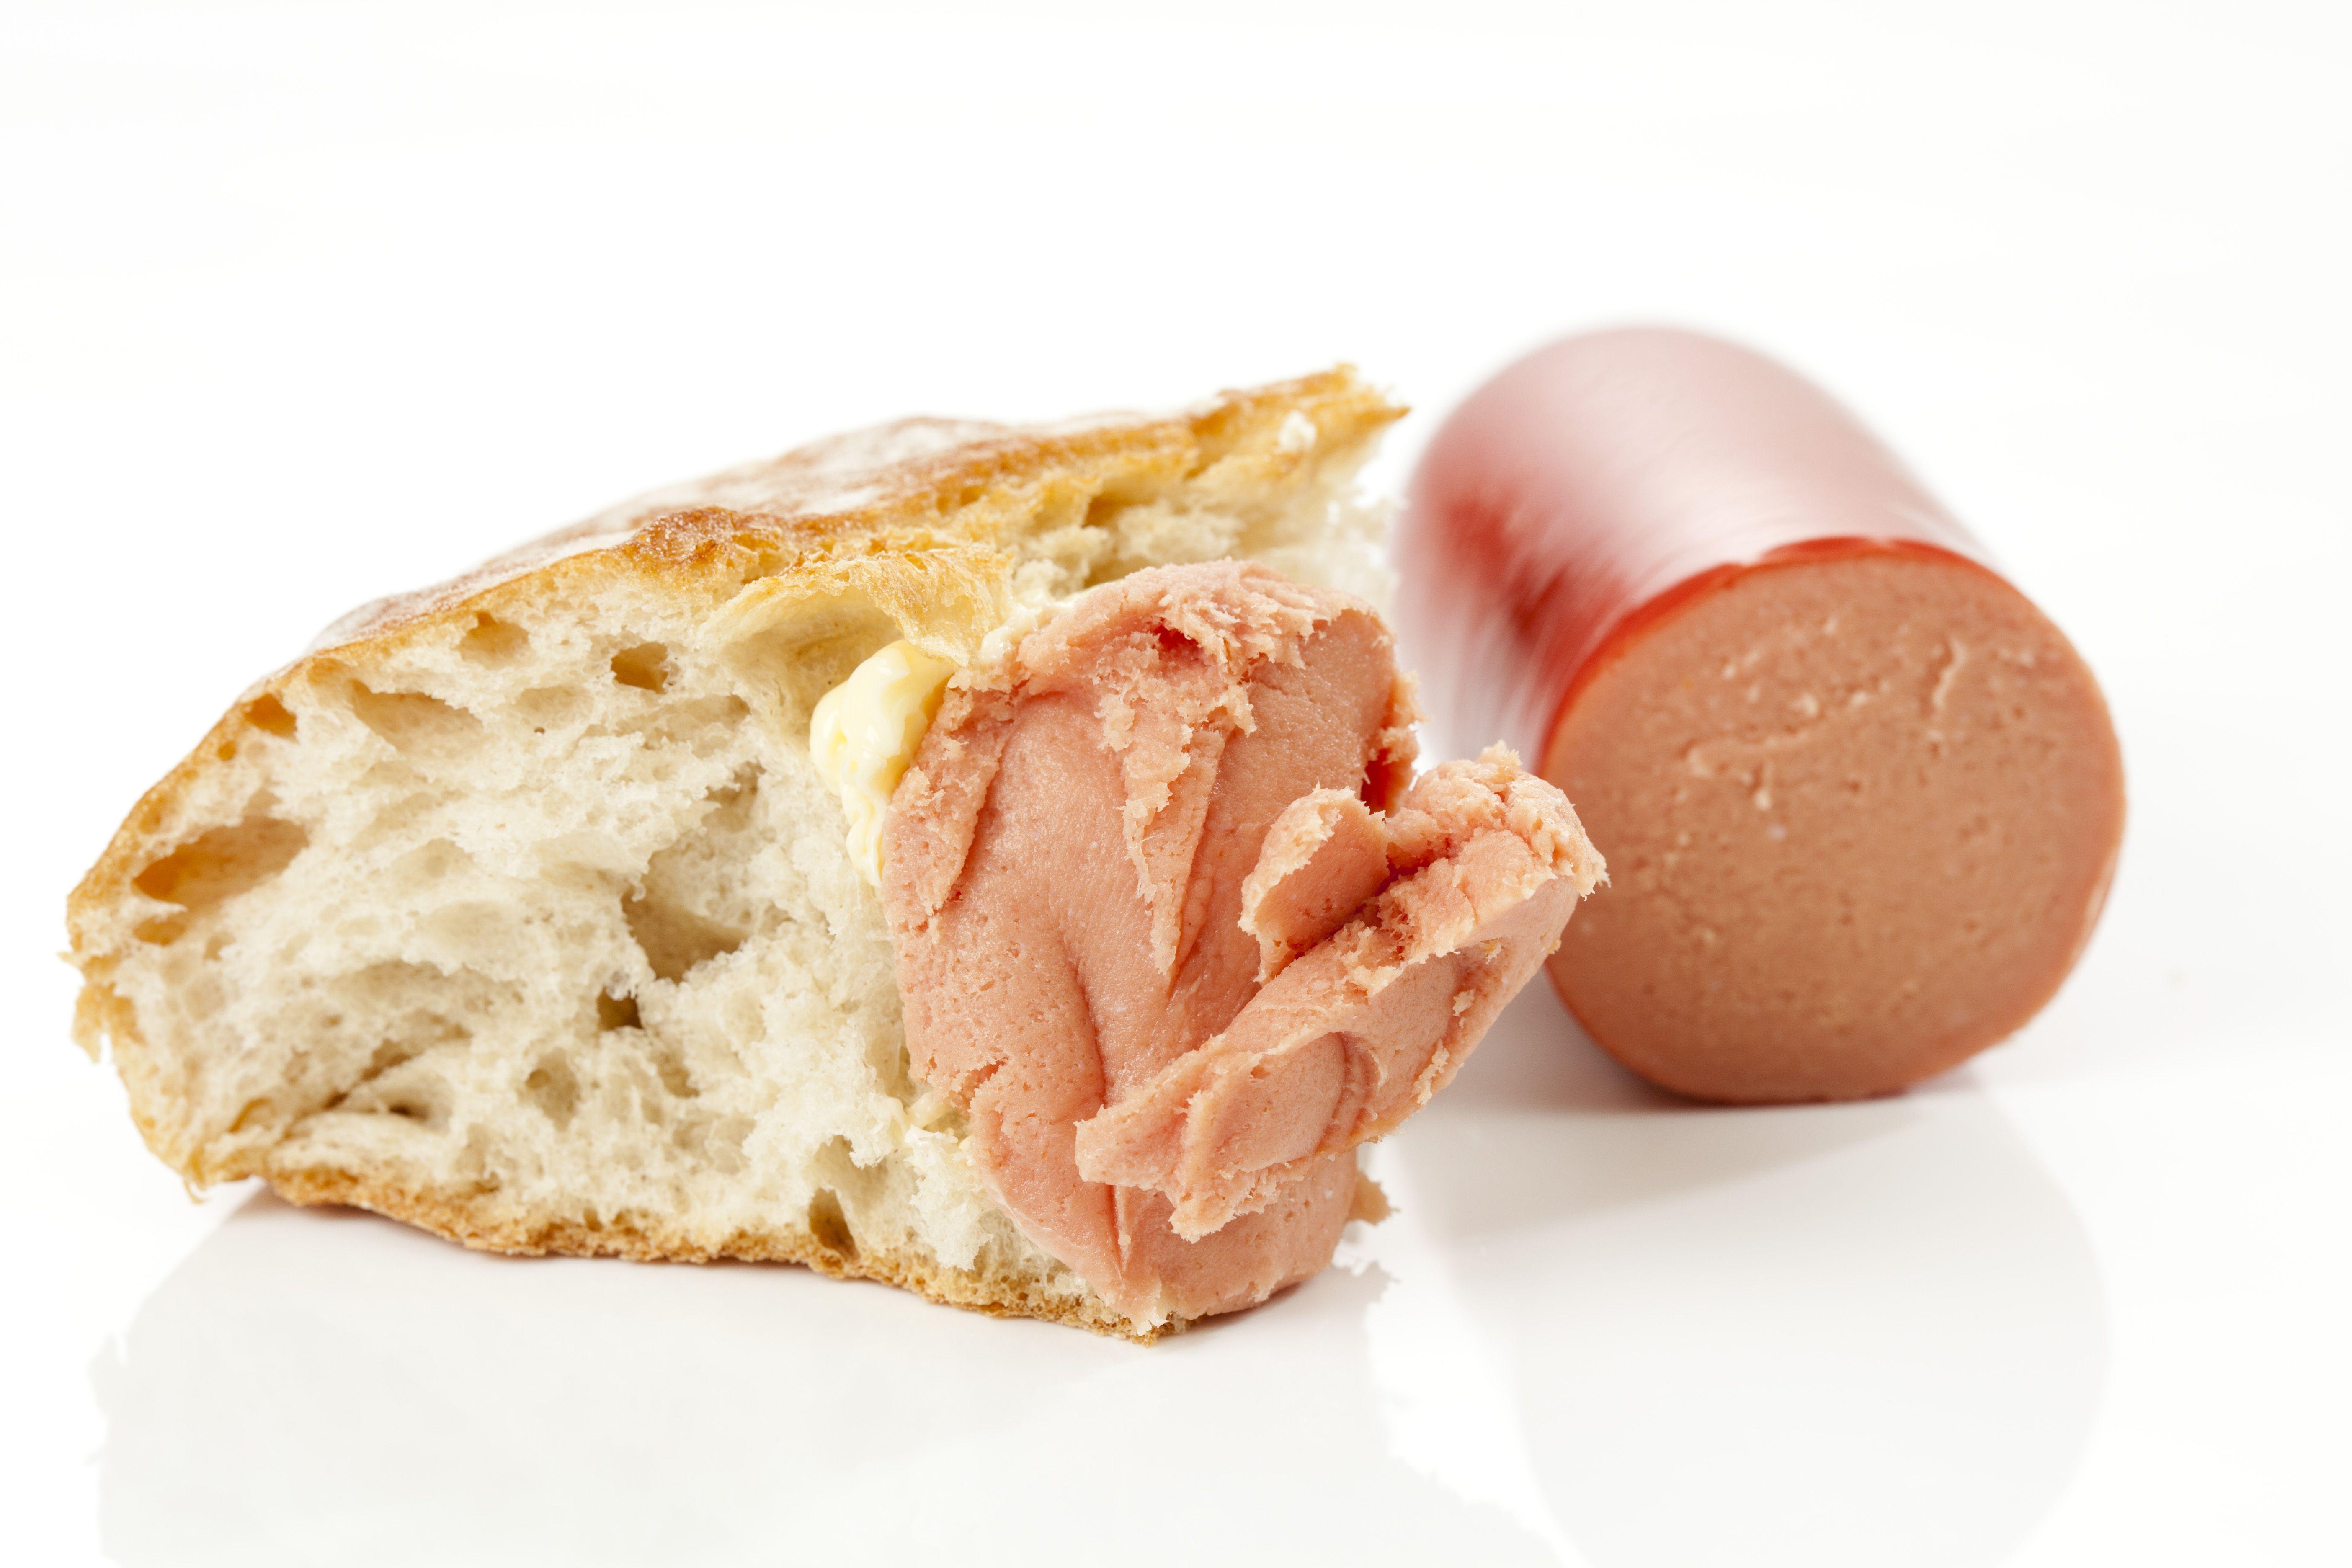 Teewurst sausage on white bread, close up